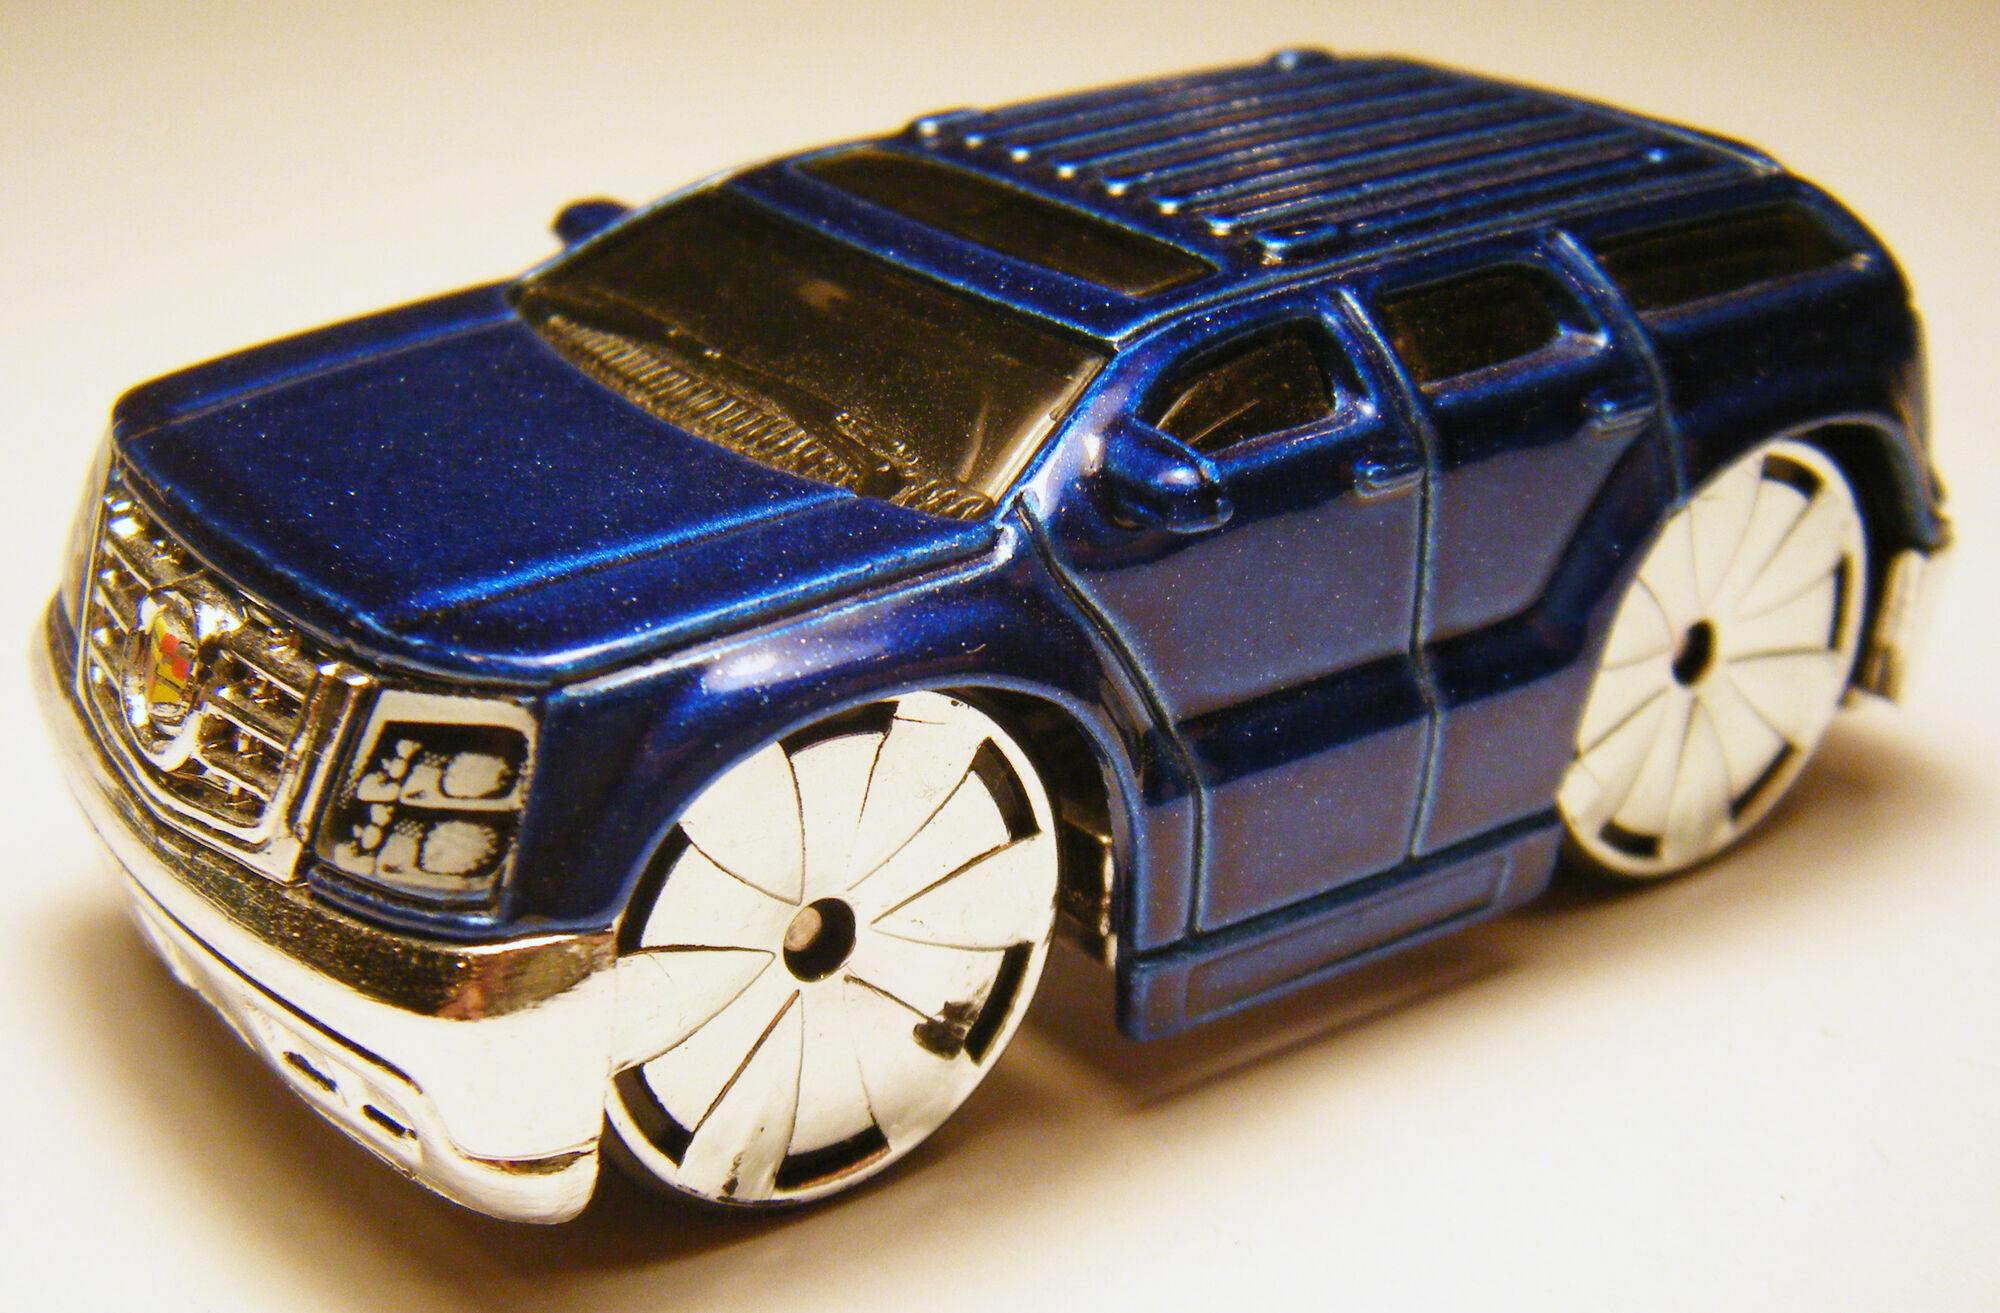 Cadillac Escalade Hot Wheels Wiki Fandom Powered By Wikia